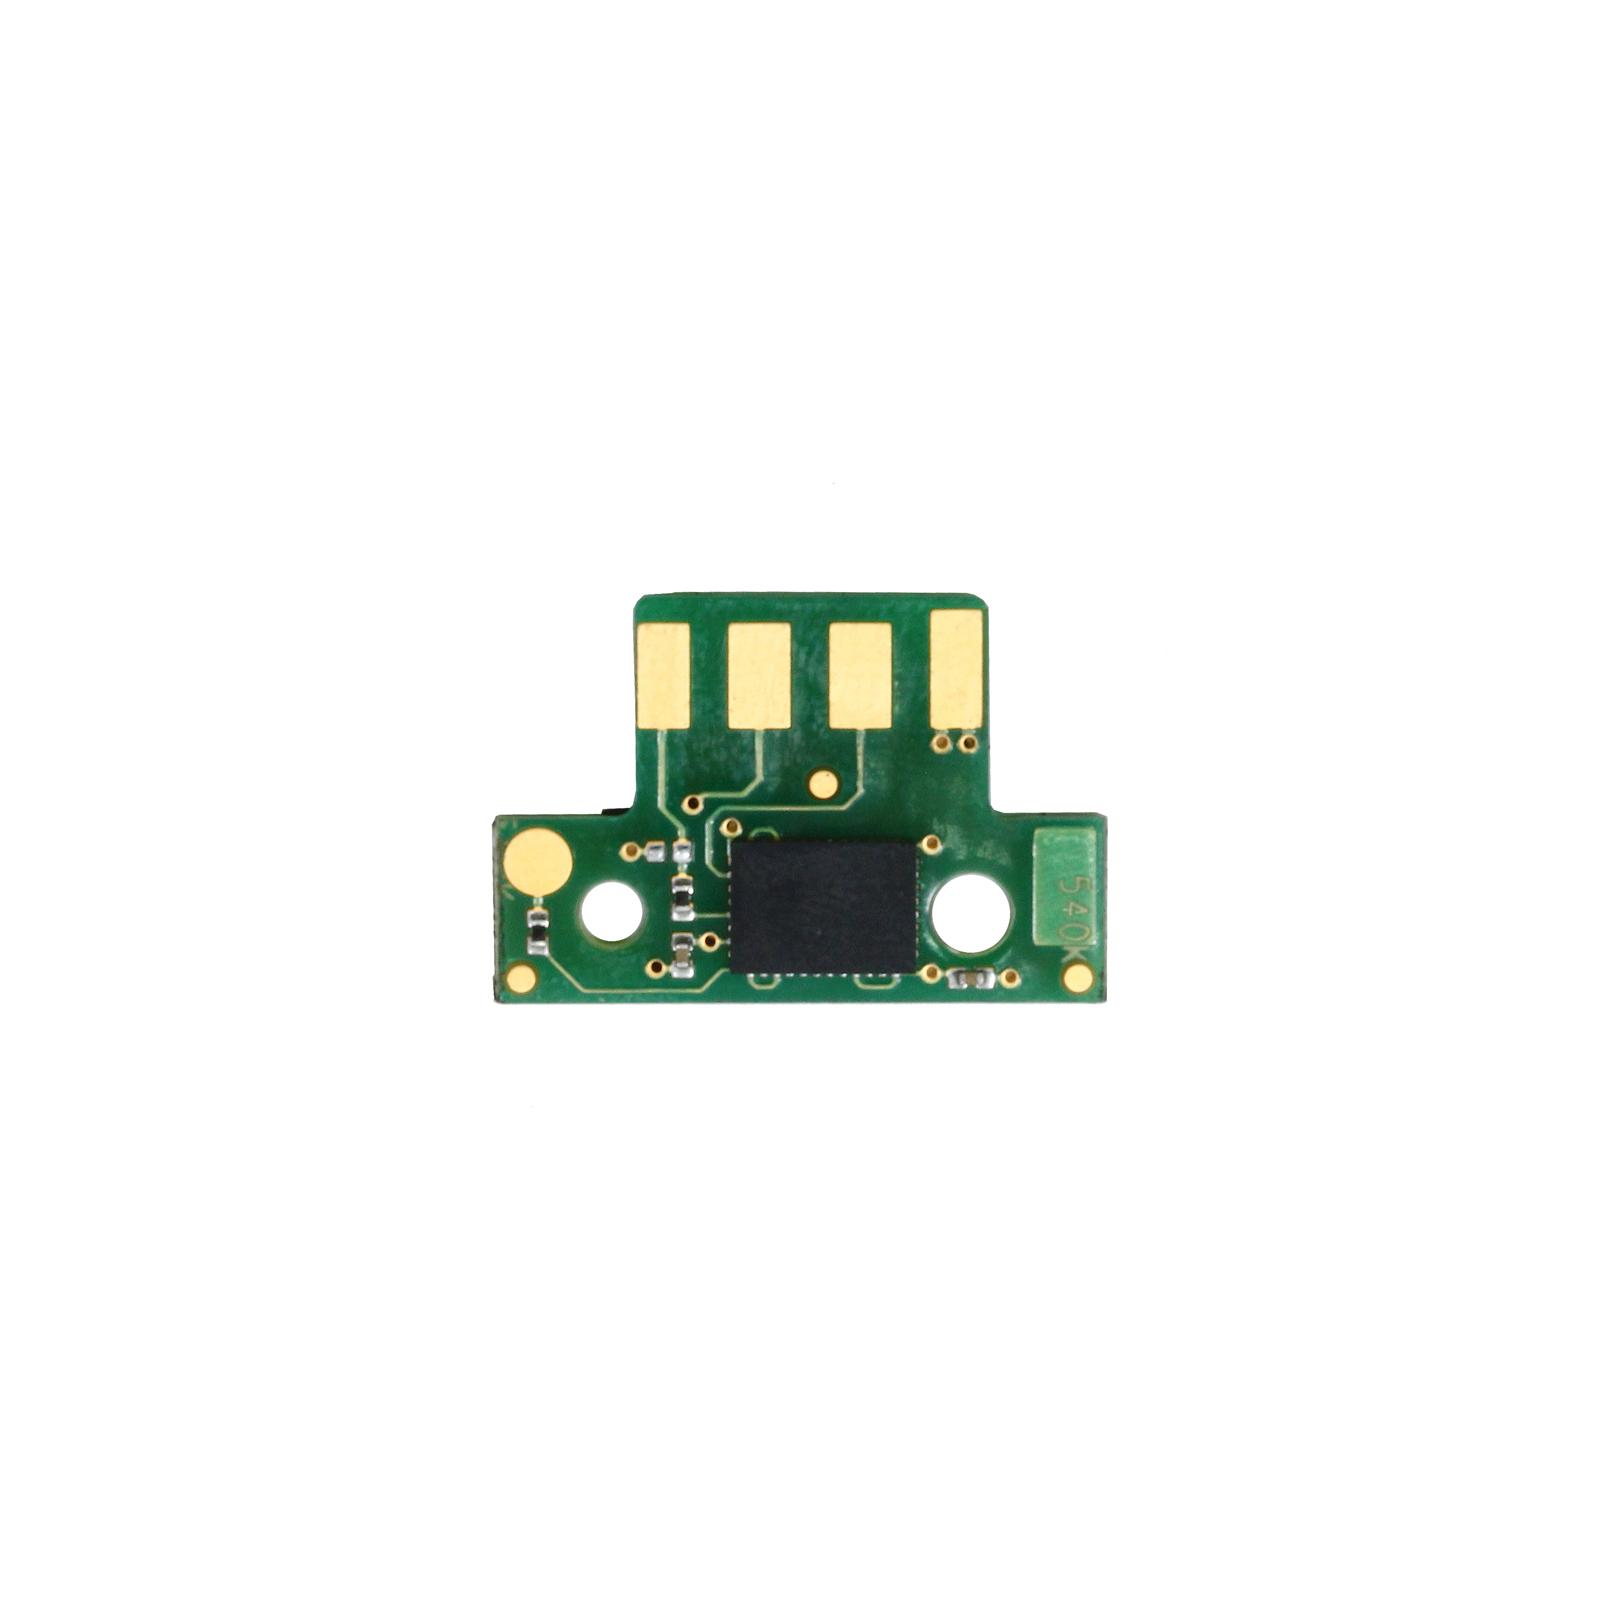 Чип для картриджа LexmarkC540 (C540H1KG/C540H2KG) 2.5k black Static Control (LC540CHIP-K)